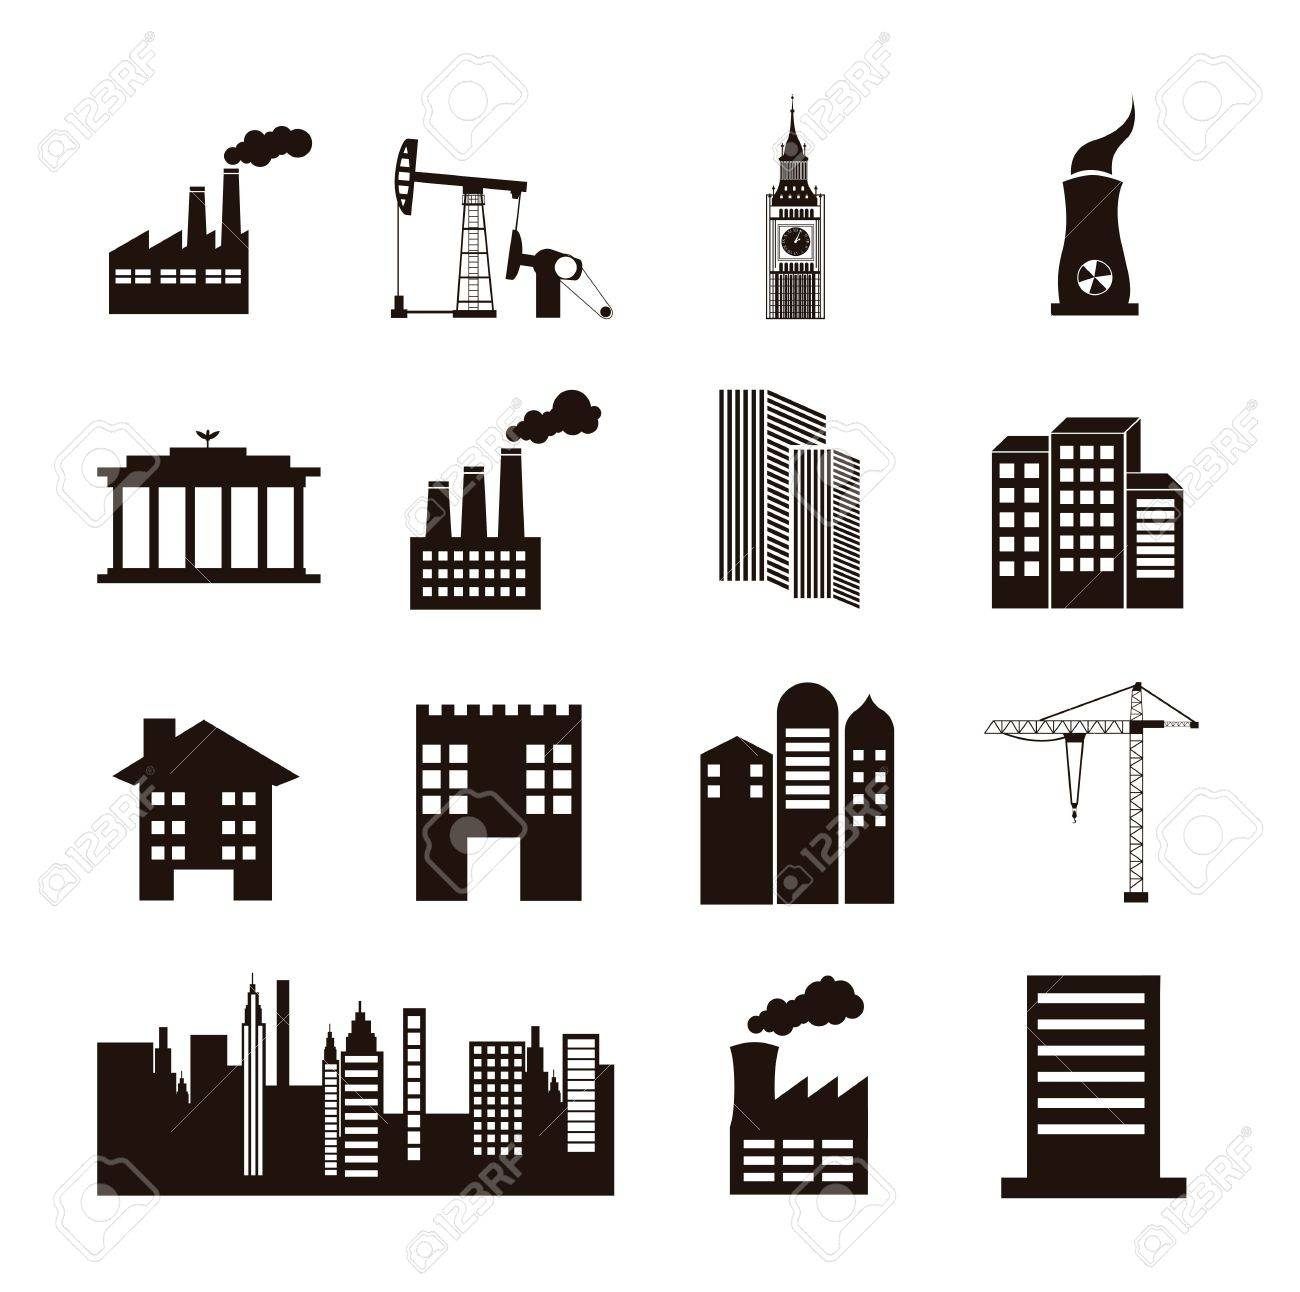 silhouette houses over white background. vector illustration Stock Vector - 16701827